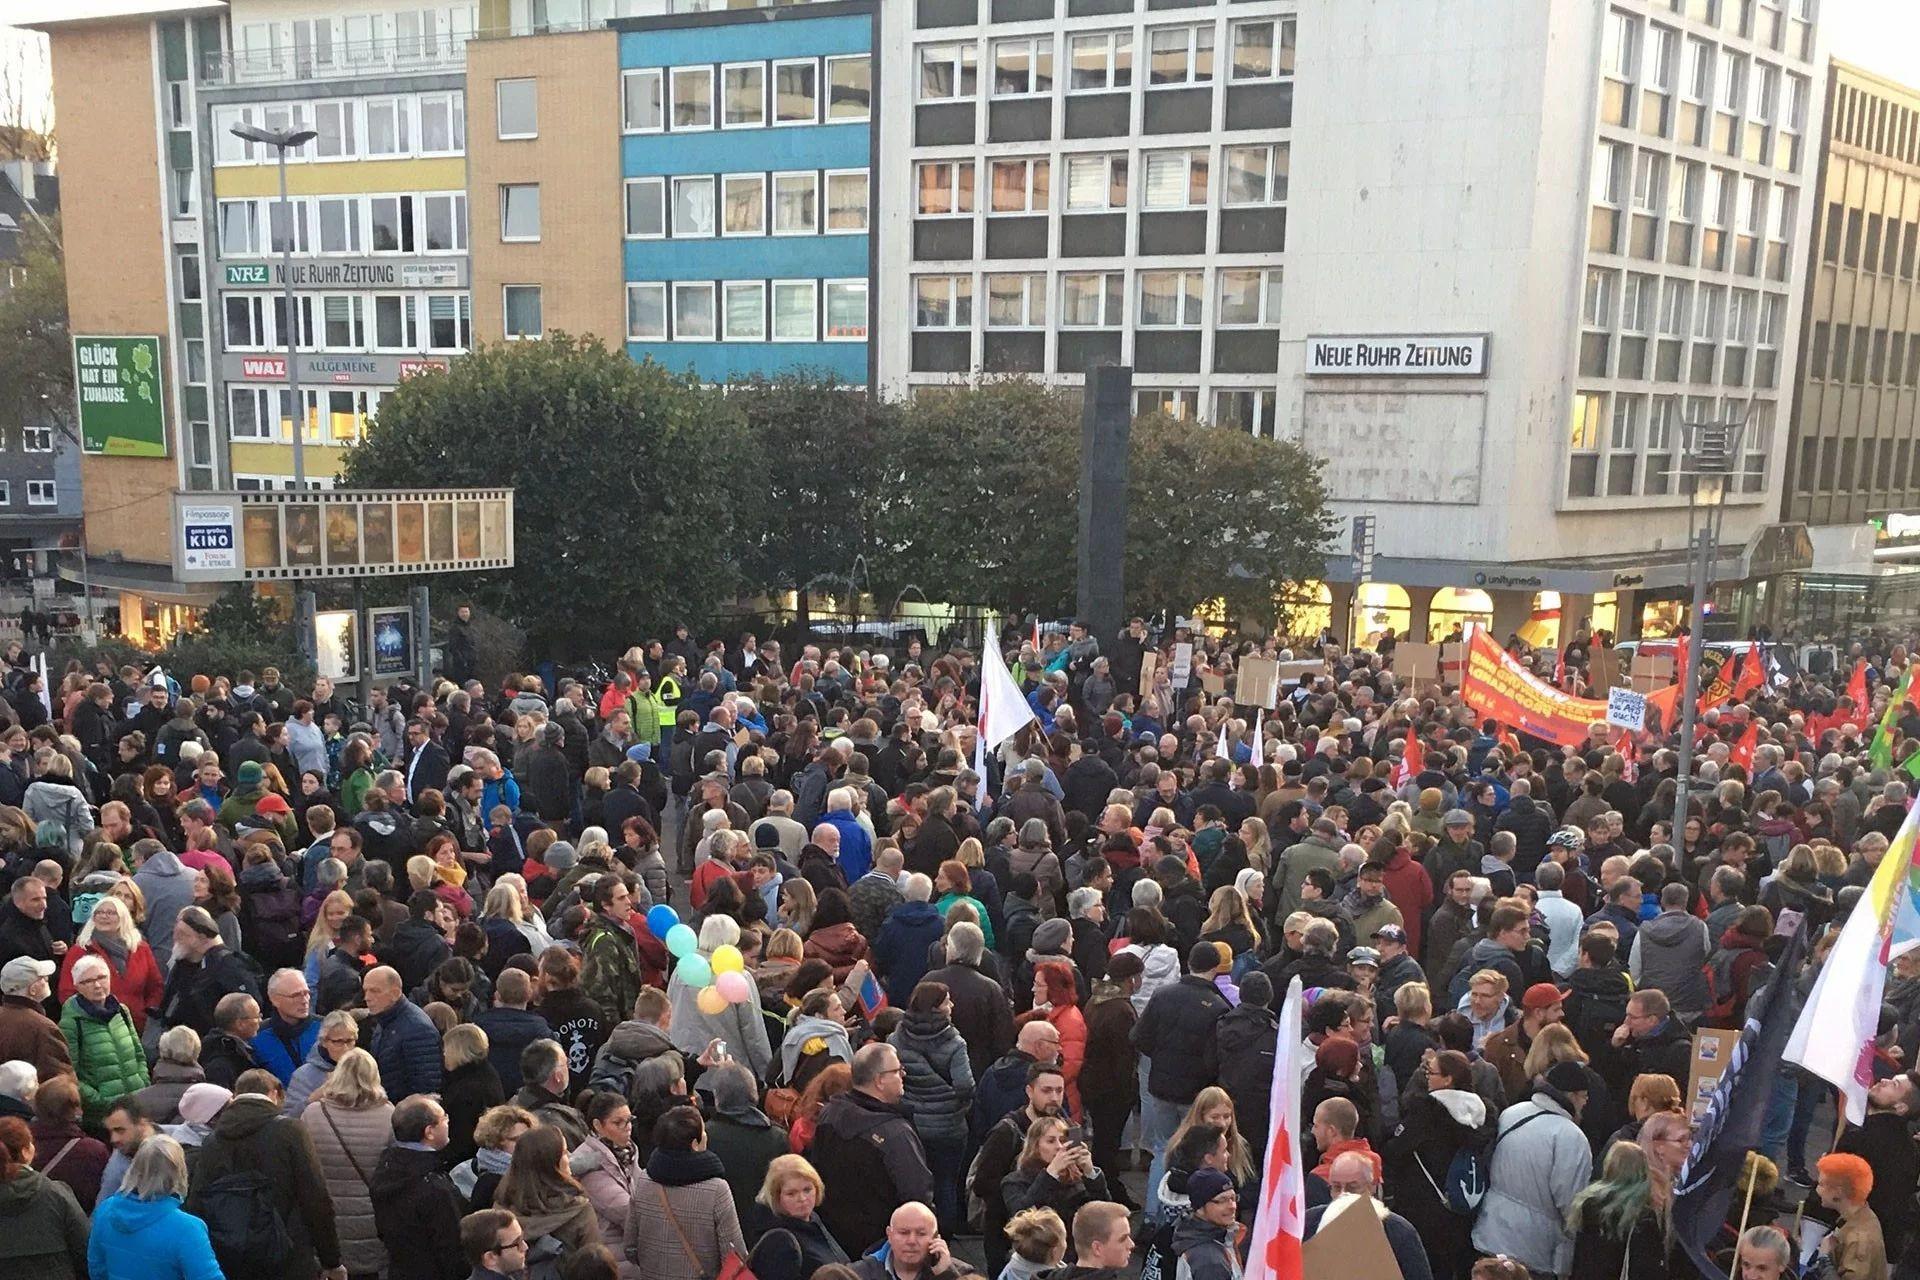 Irkçı AfD'nin 'Yurttaş Diyaloğu' toplantısı protesto edildi